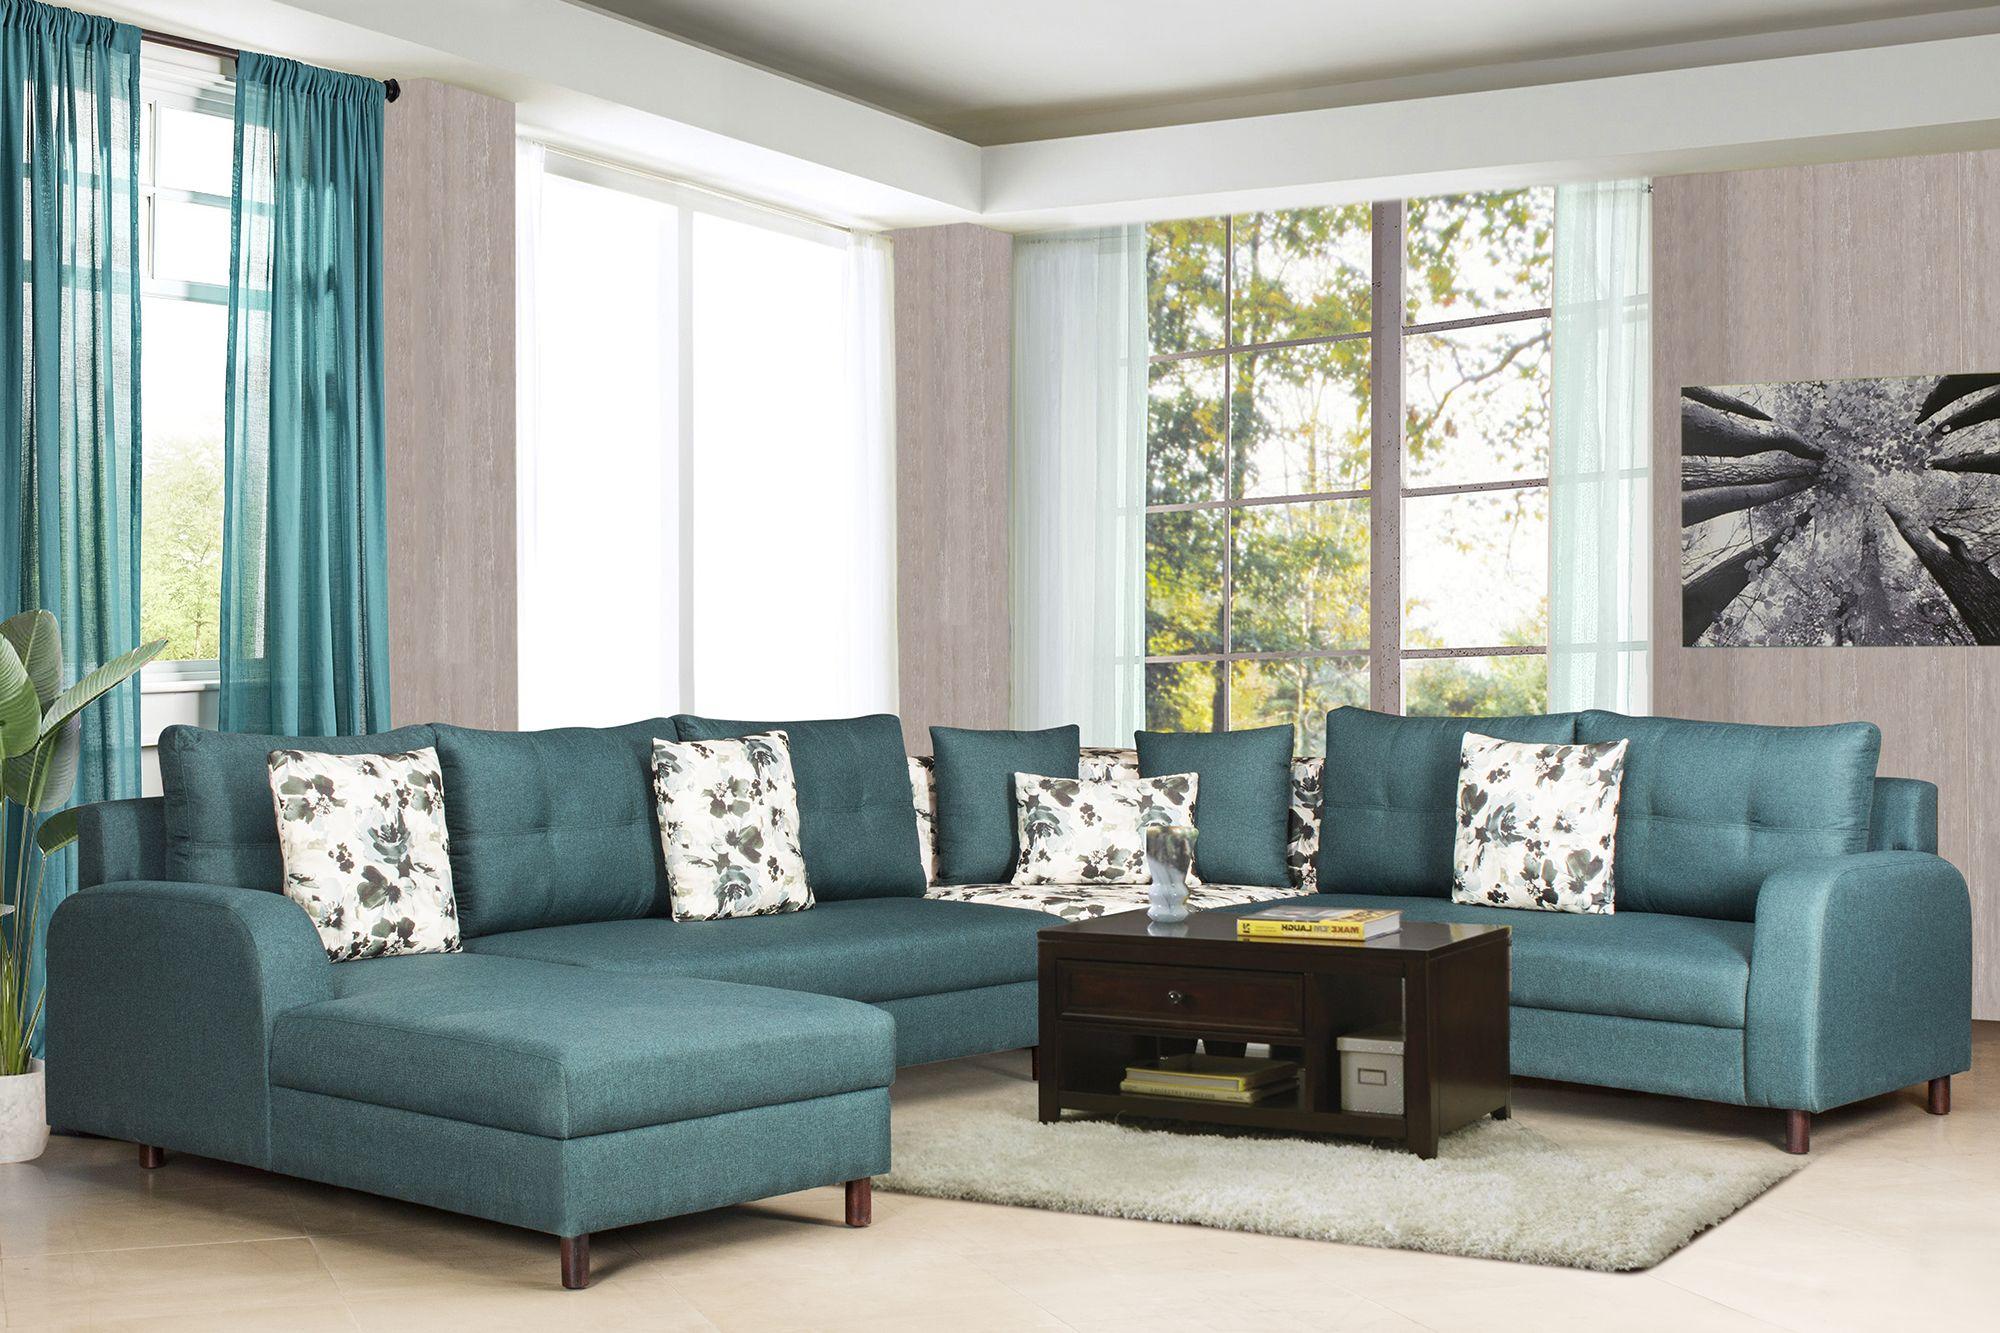 A La Carte Blue Fabric Corner Sofa Set Corner Sofa Set Furniture Shabby Chic Furniture